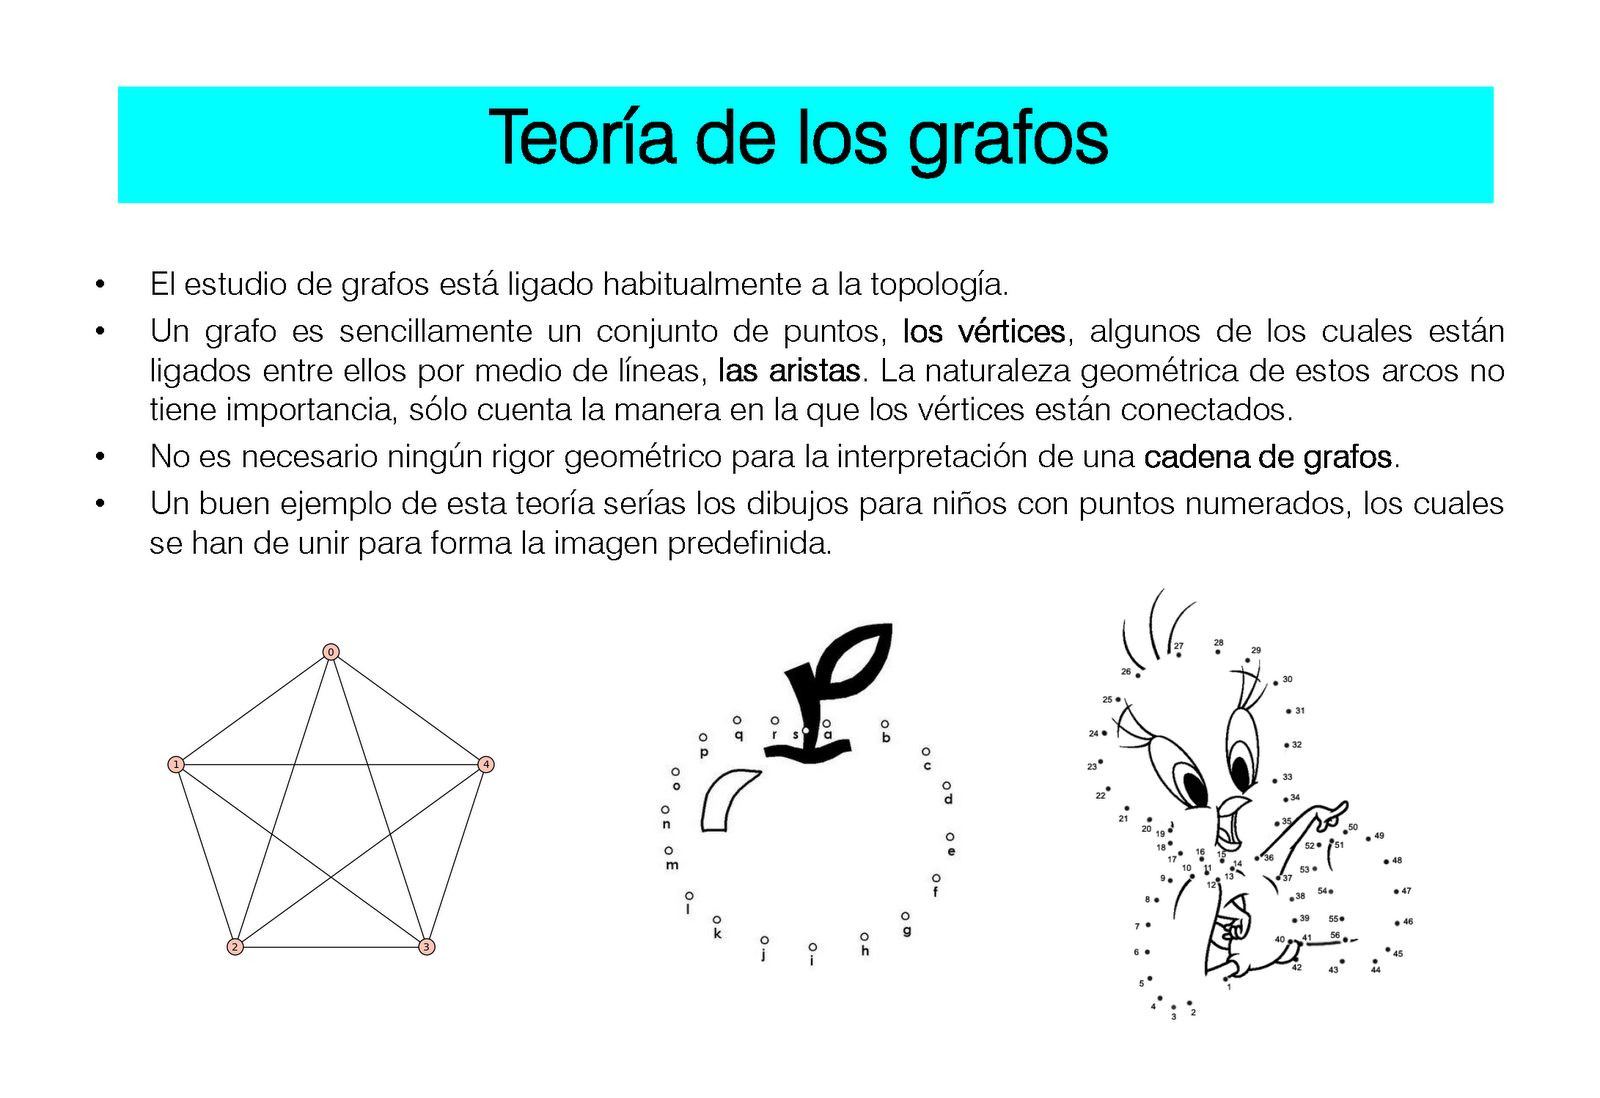 Nuevo juego topol gico investigaci n sobre la topolog a y for Investigar sobre la arquitectura